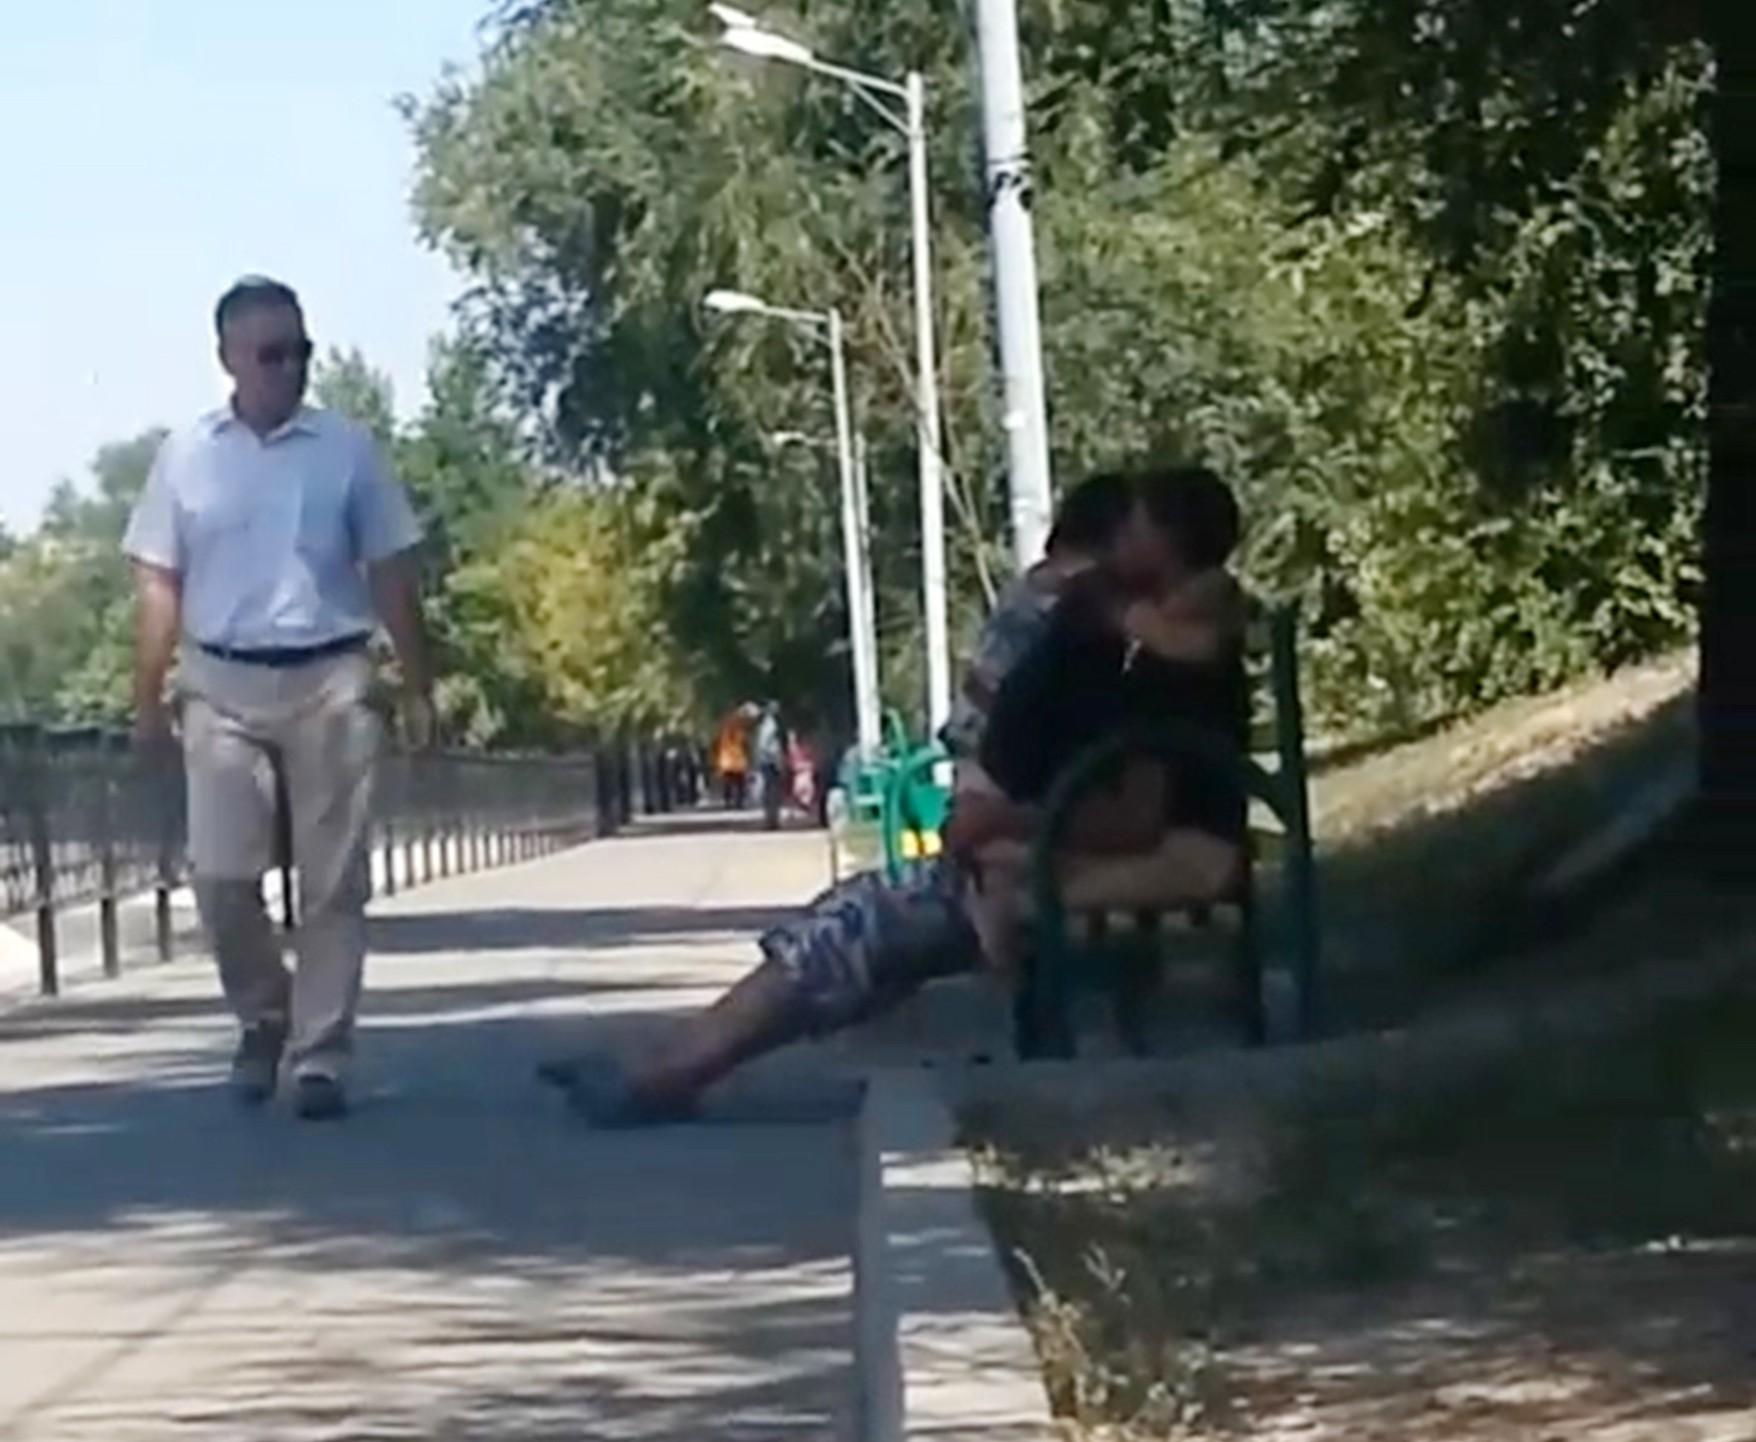 Couple caught on park bench having sex